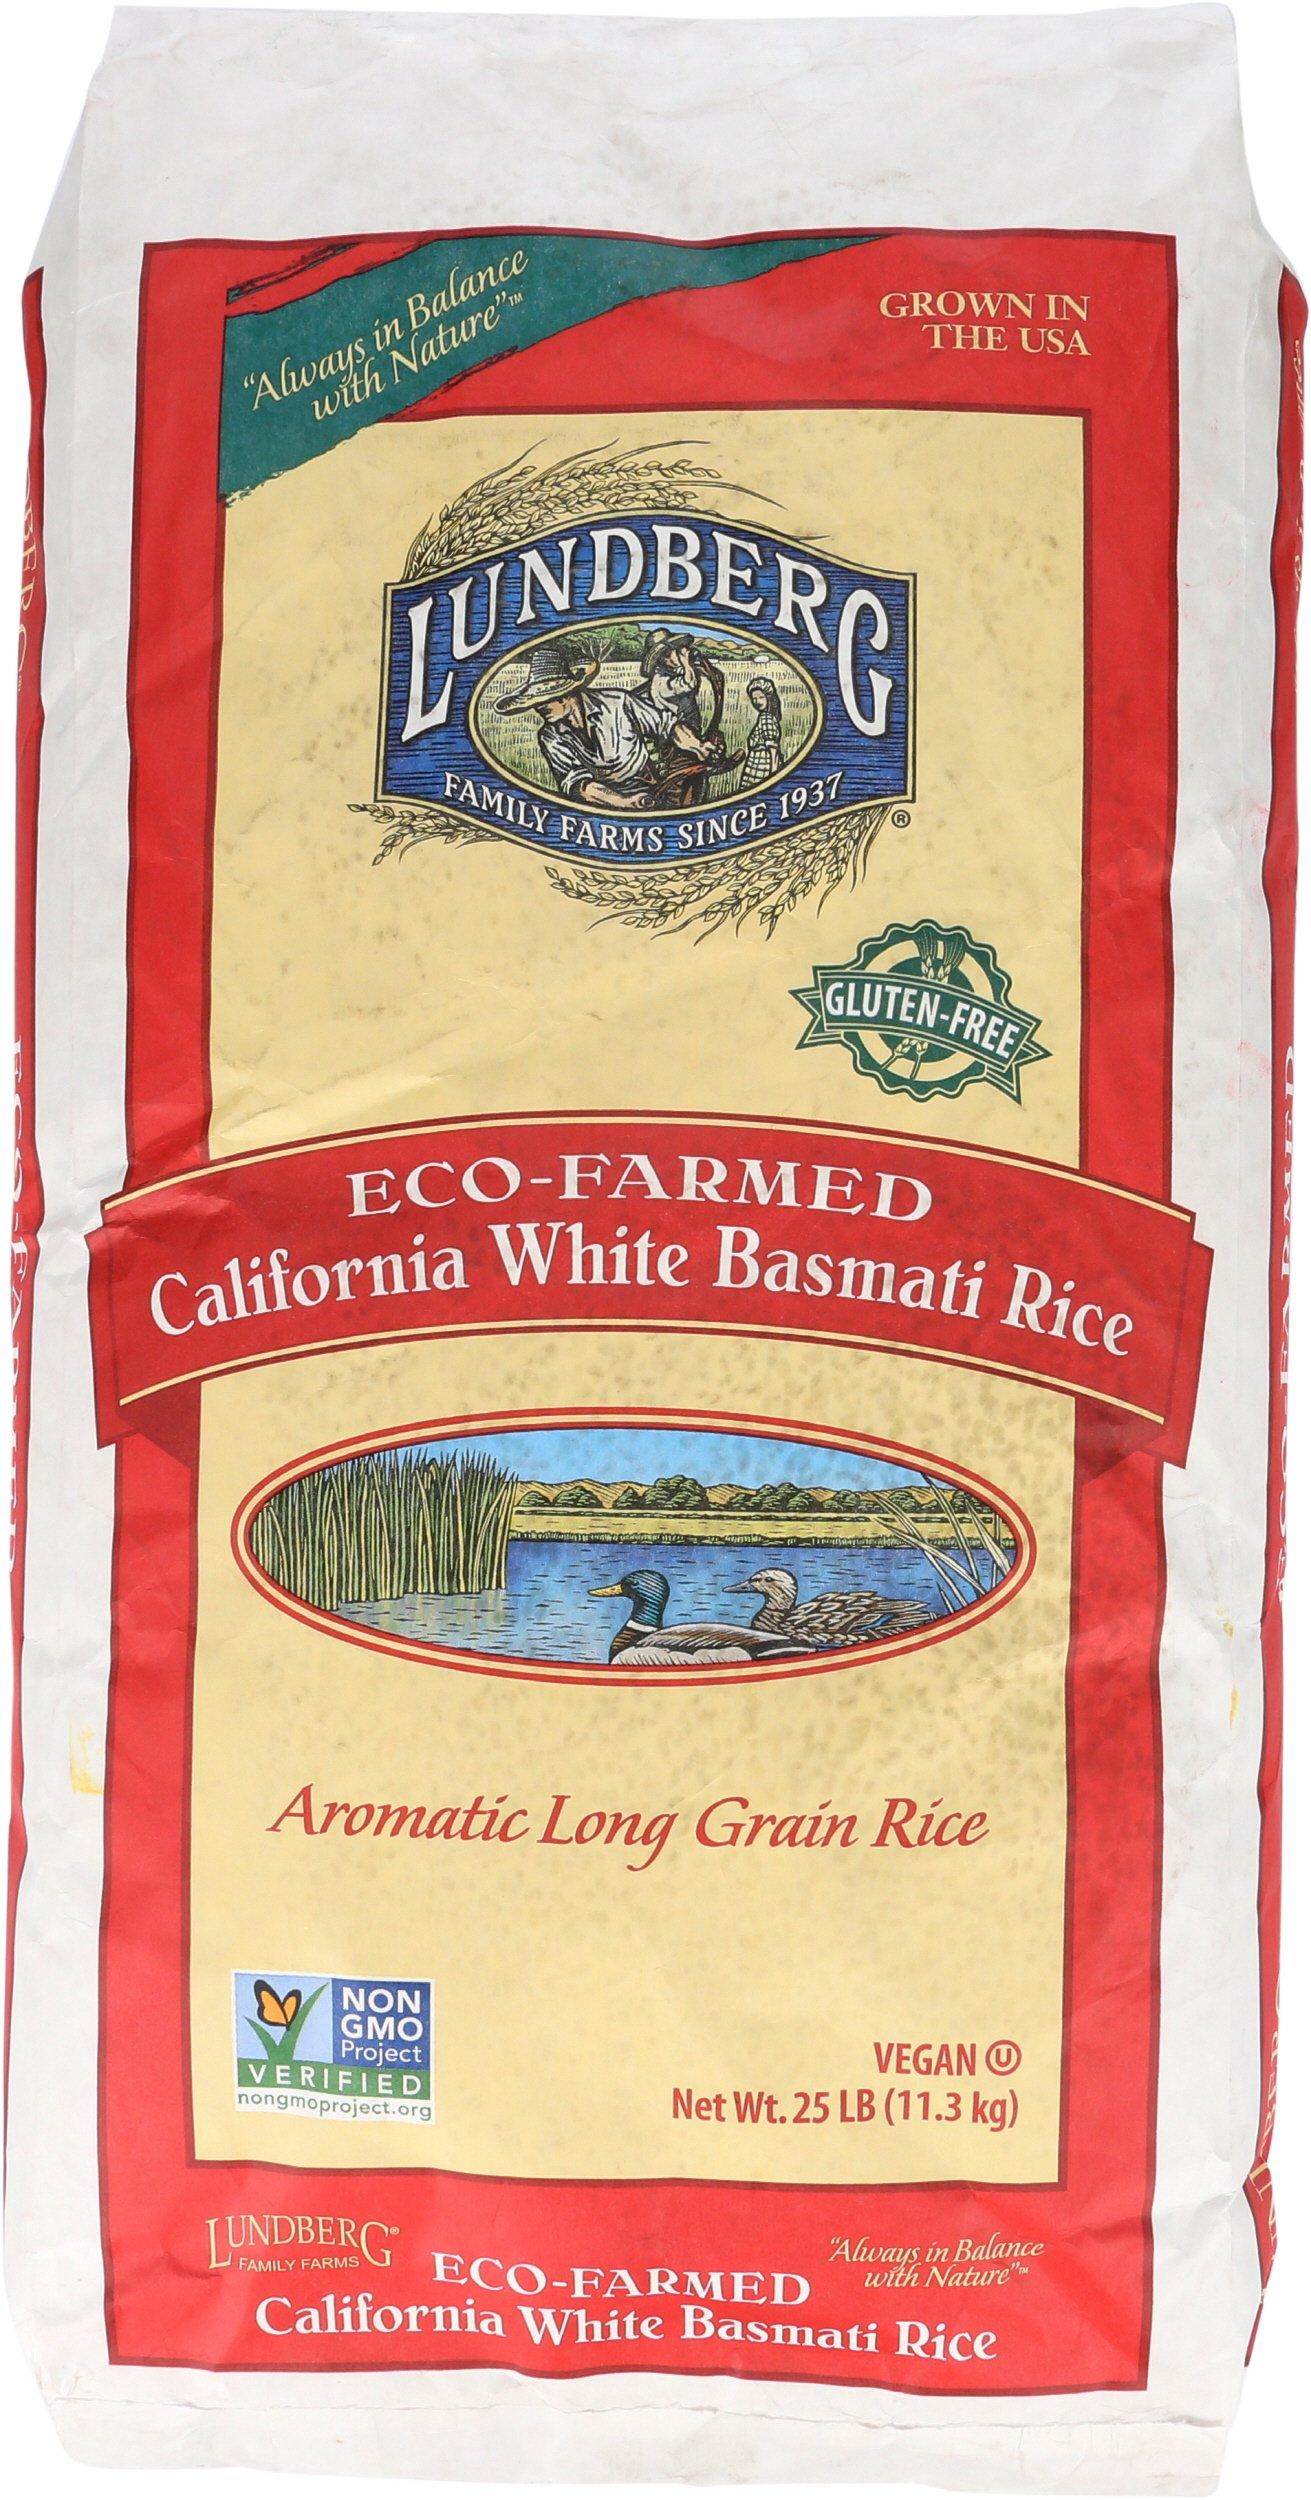 Lundberg Family Farms Basmati Rice, California White, 400 Ounce (Pack of 1) by Lundberg